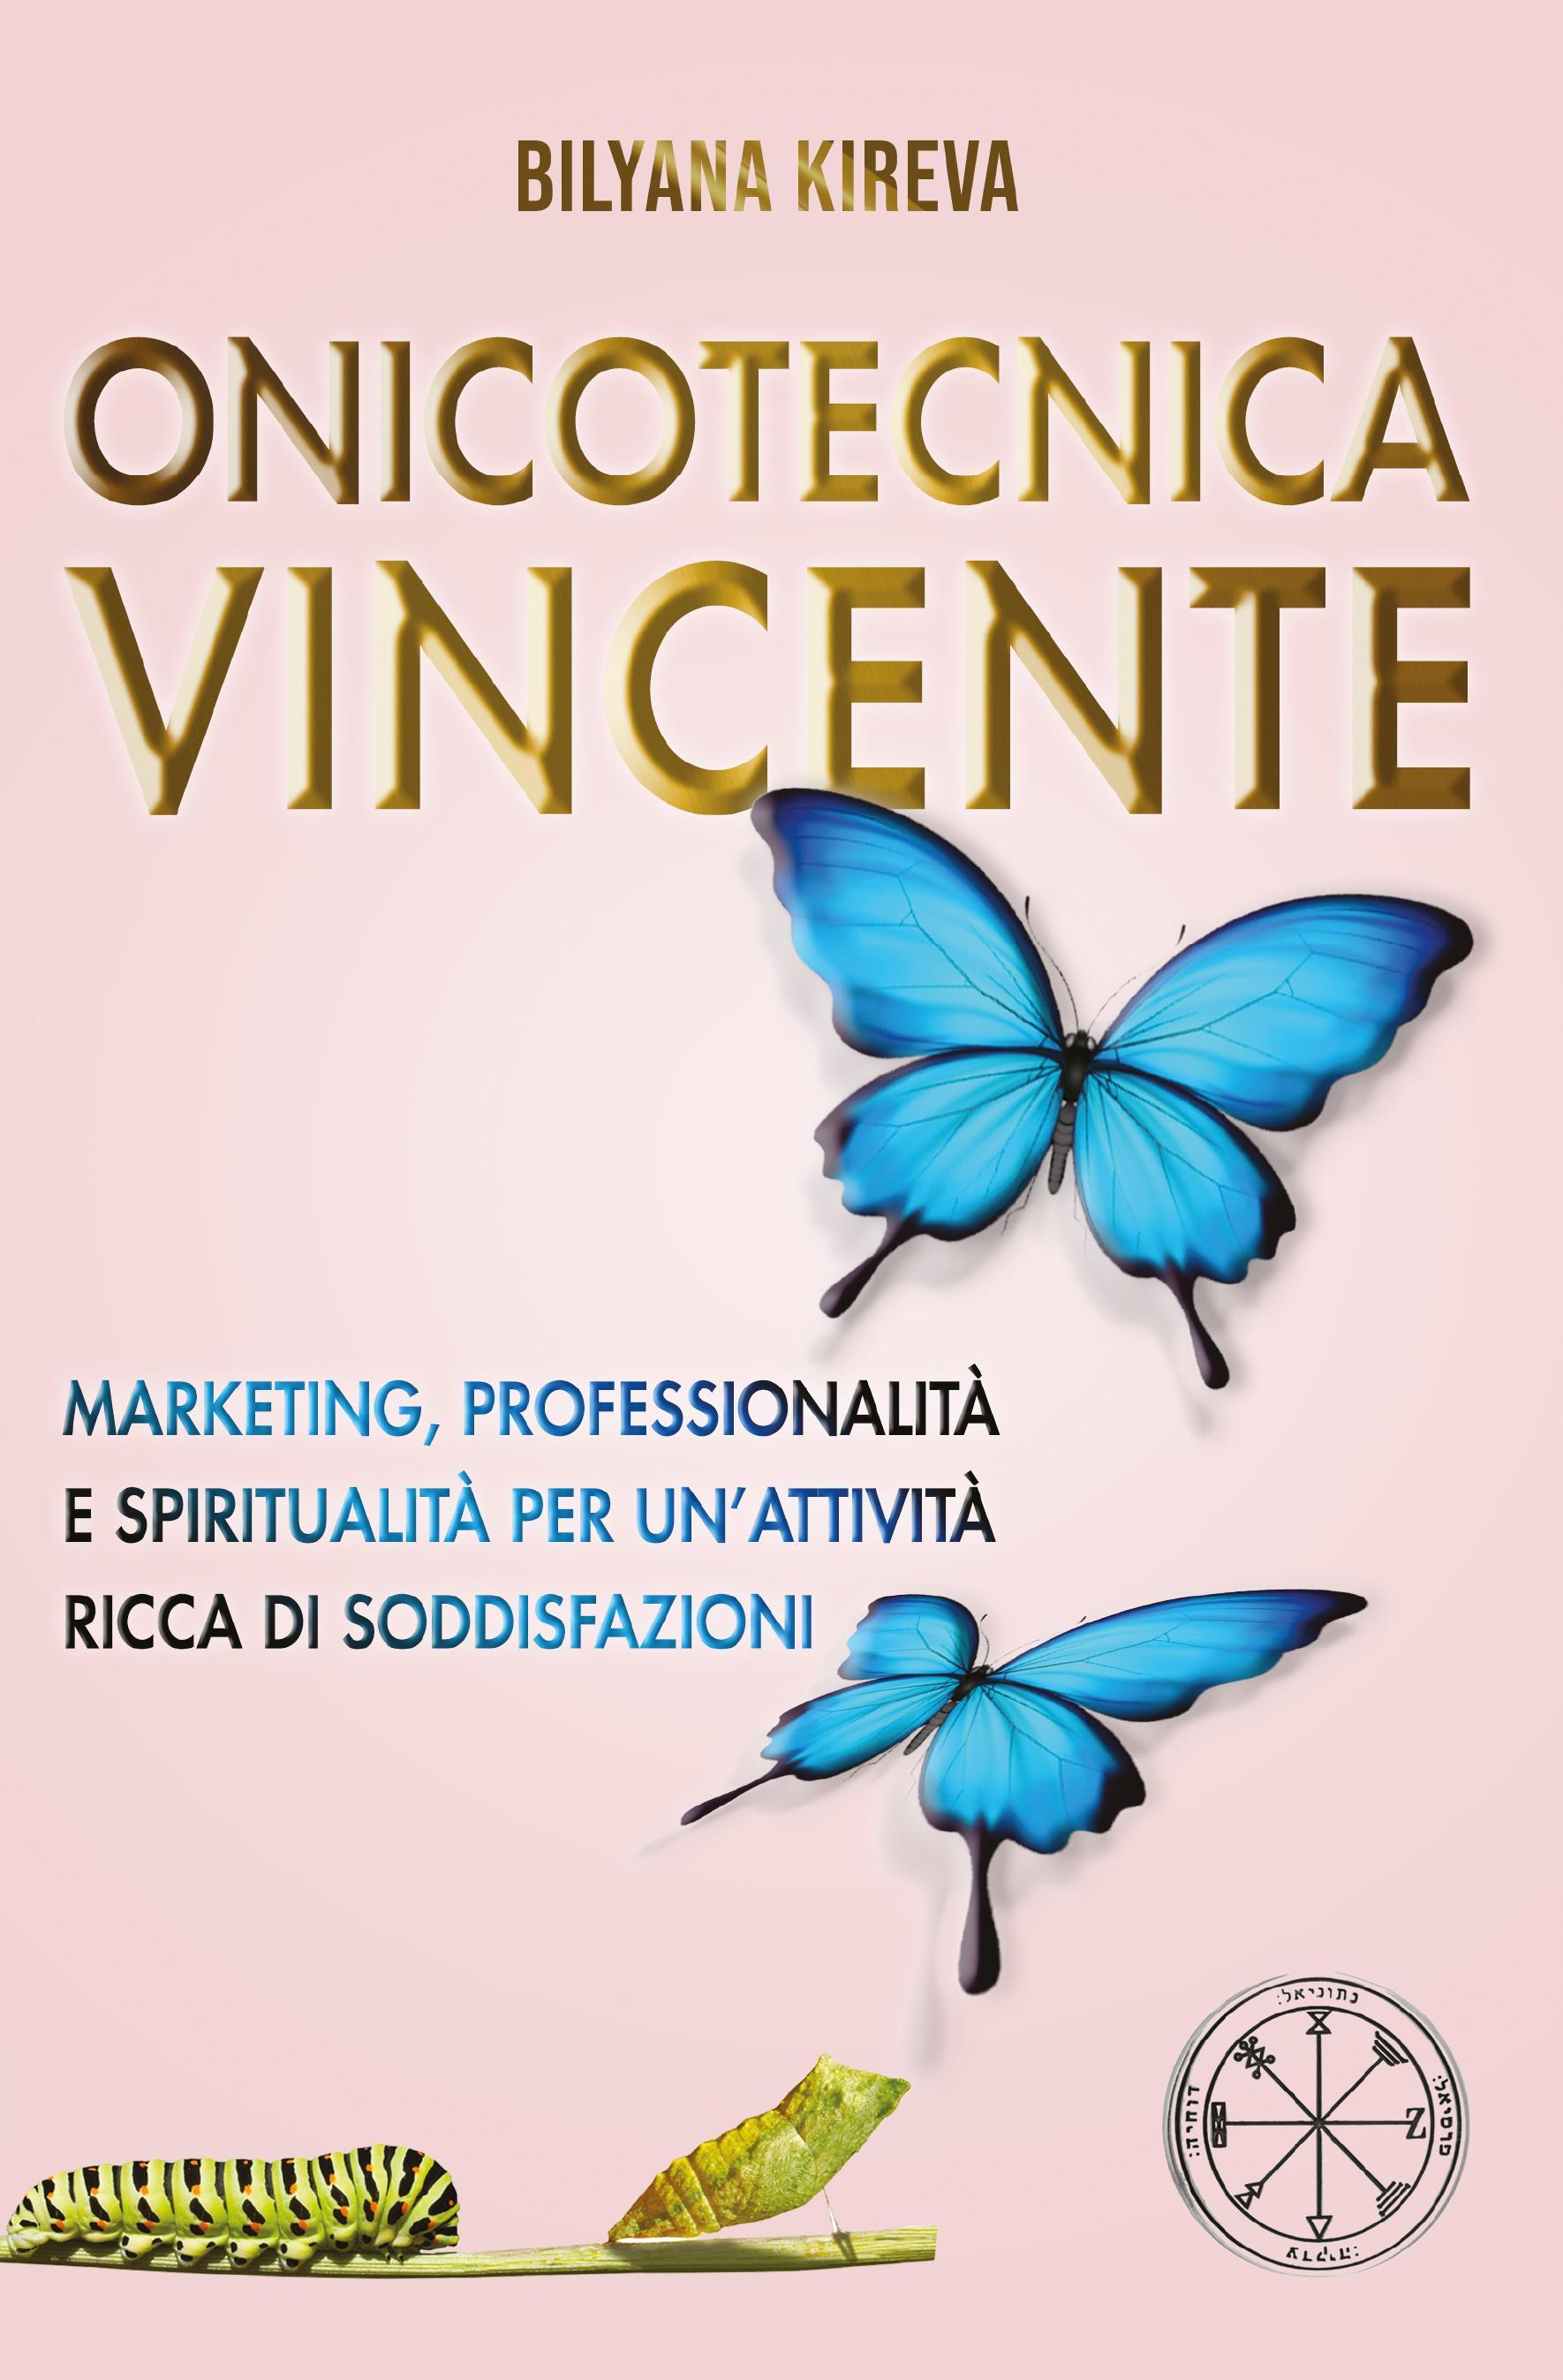 Onicotecnica Vincente